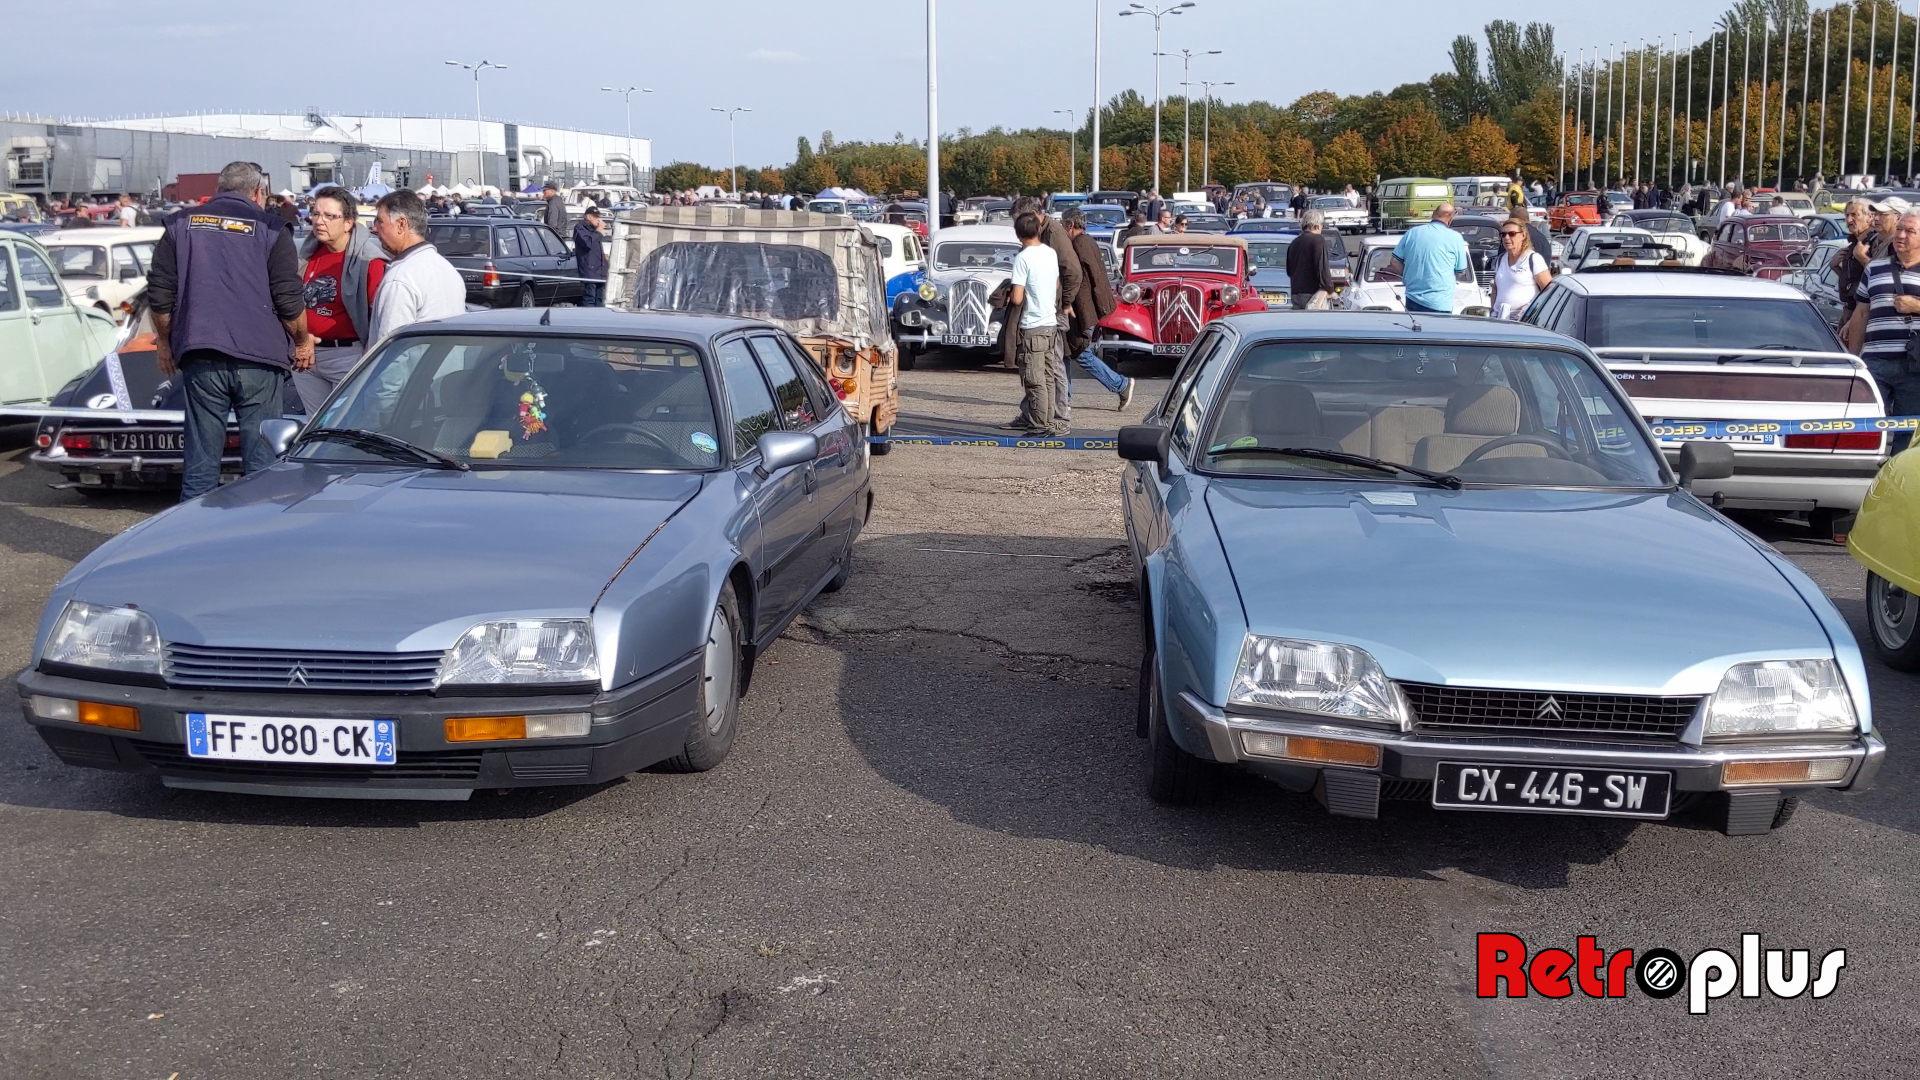 Automedon2019-parkingCitroen16